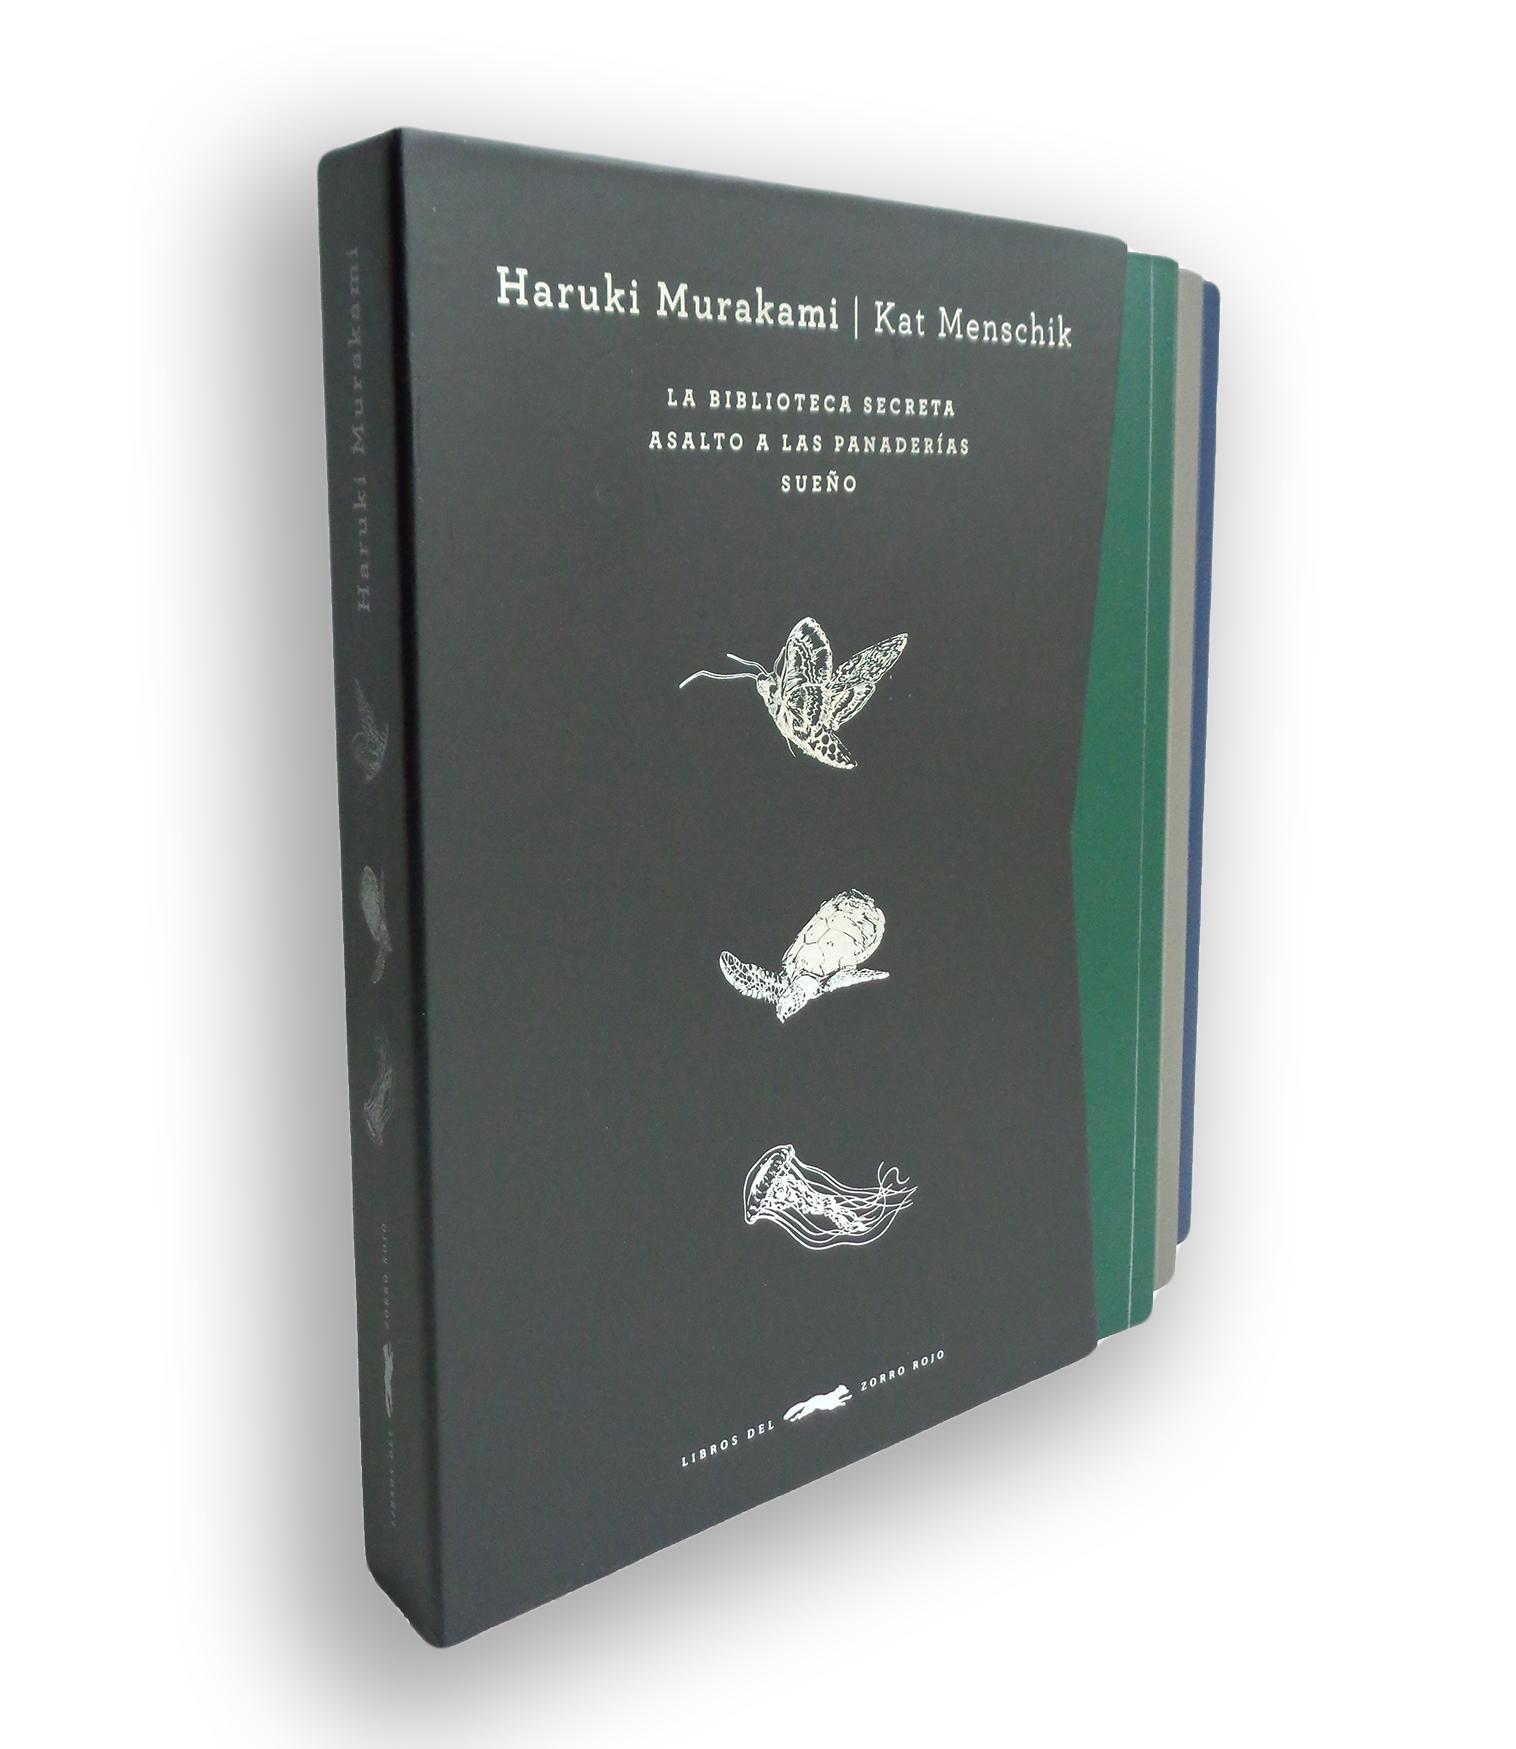 trilogia haruki murakami (contiene: la biblioteca secreta; asalto a las panaderias; sueño)-haruki murakami-9788494570926